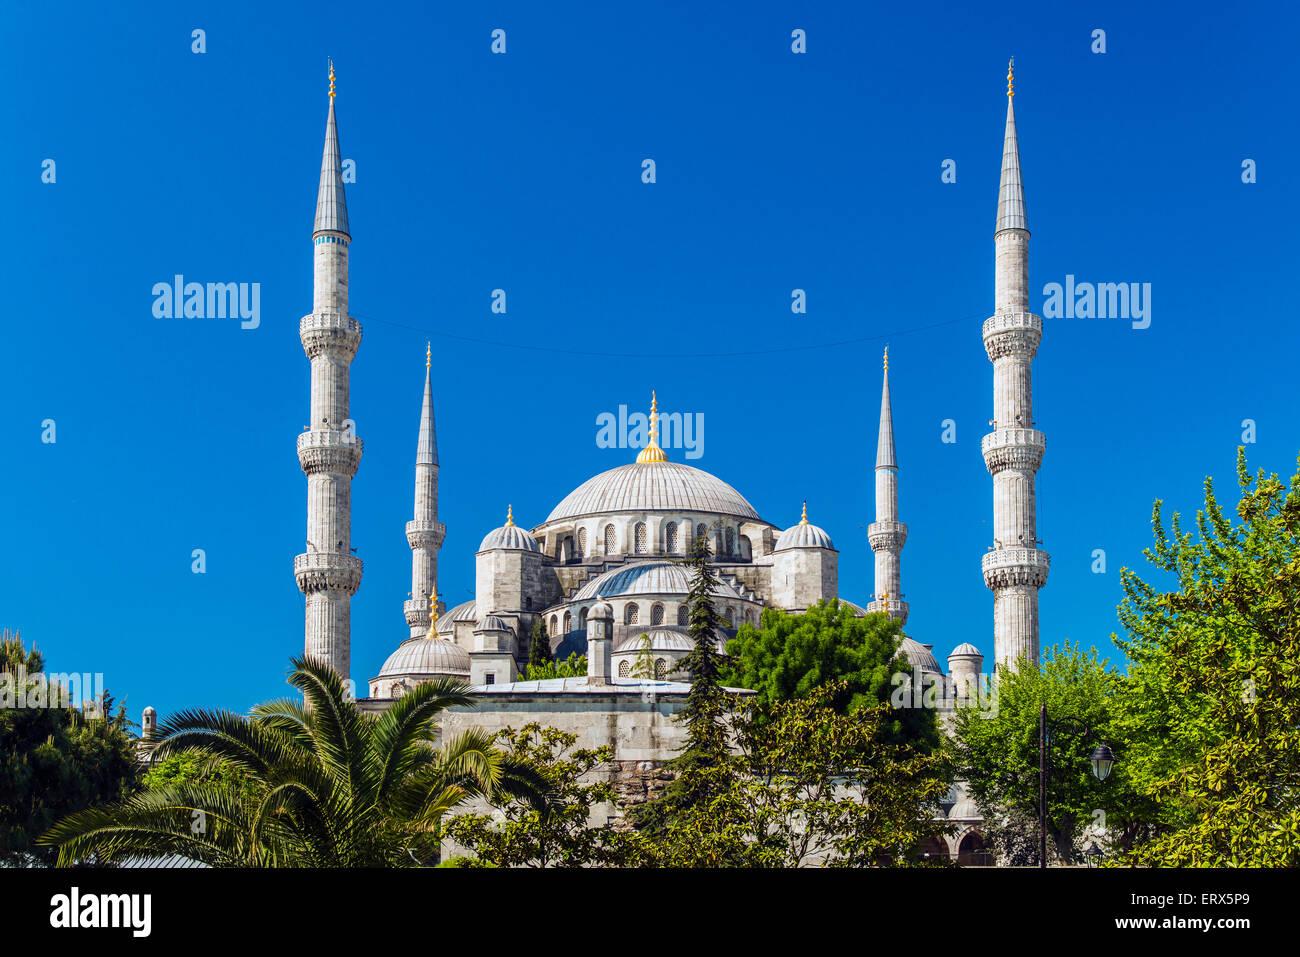 Sultan Ahmed moschea o la Moschea Blu, Sultanahmet, Istanbul, Turchia Immagini Stock